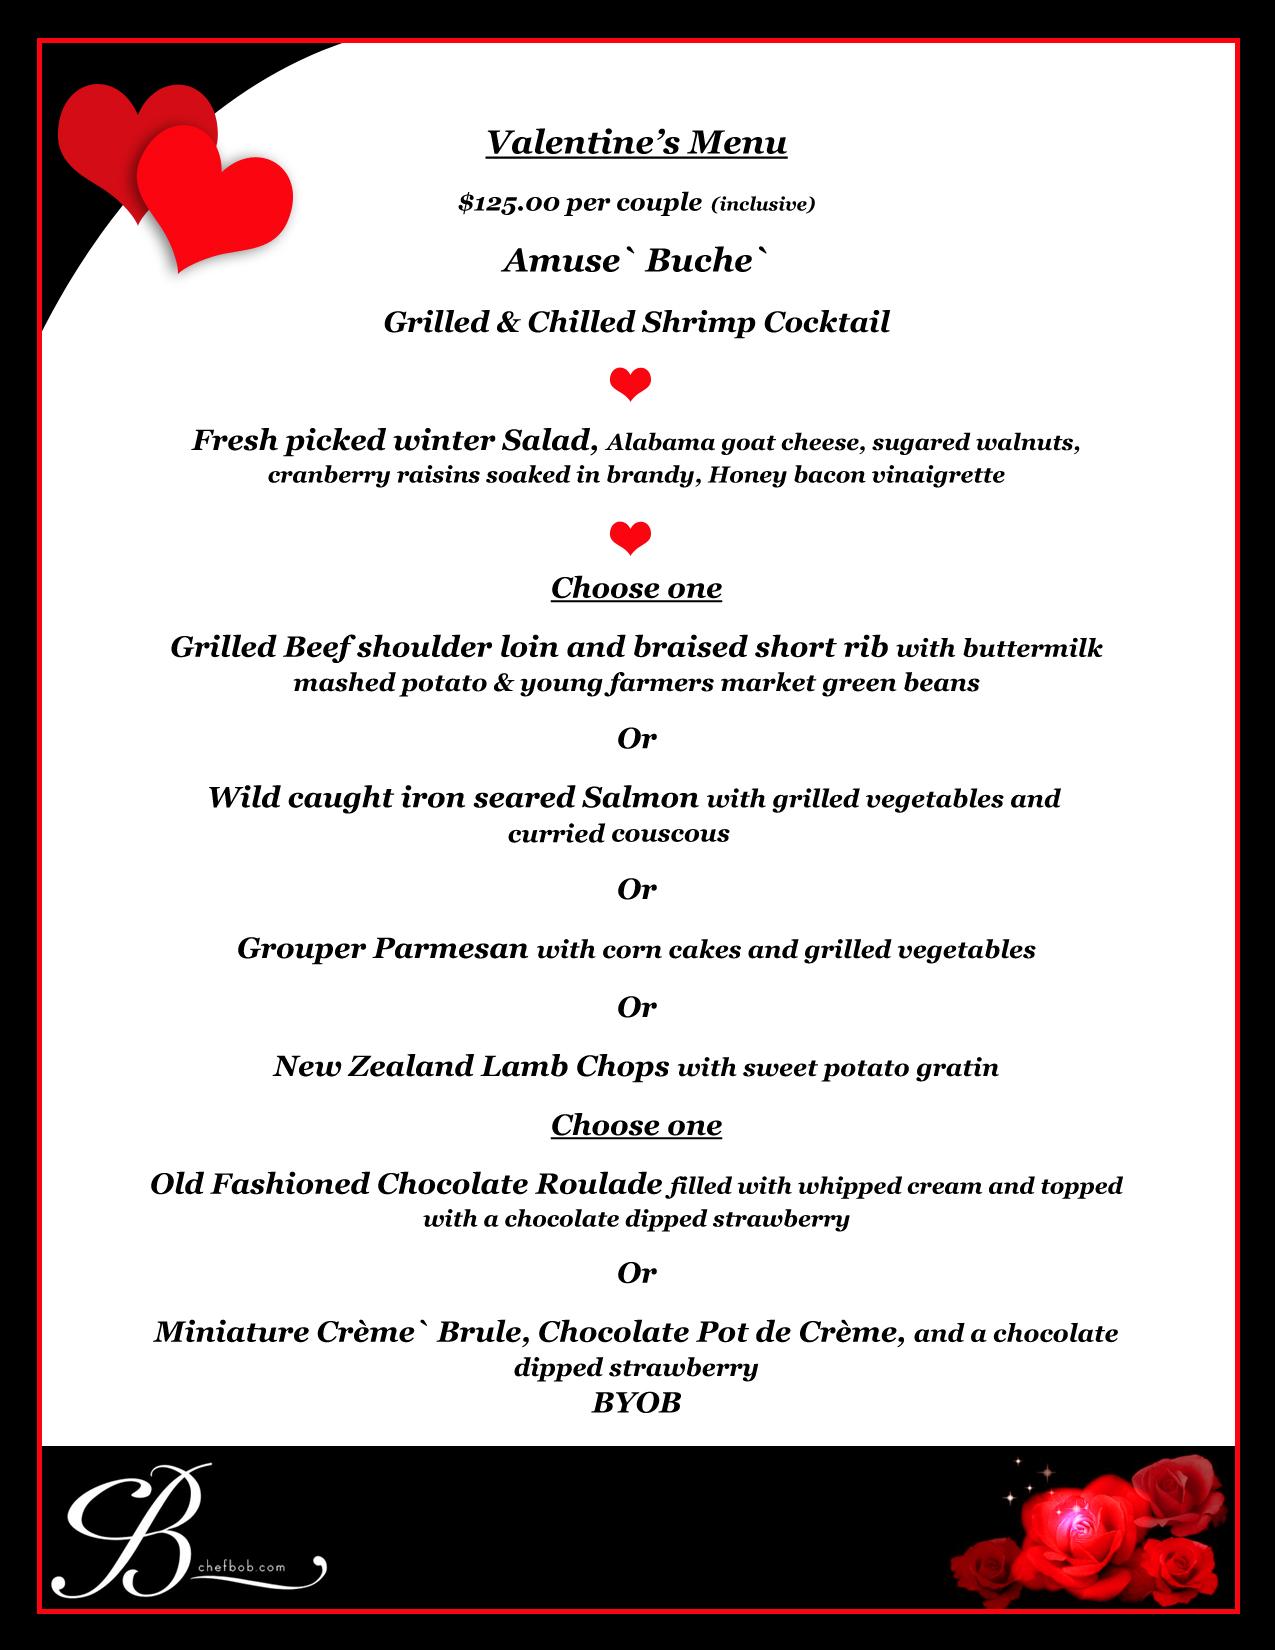 Valentine 39 s day dinner by chef bob tickets tue feb 14 for Romantic valentine dinner menu ideas